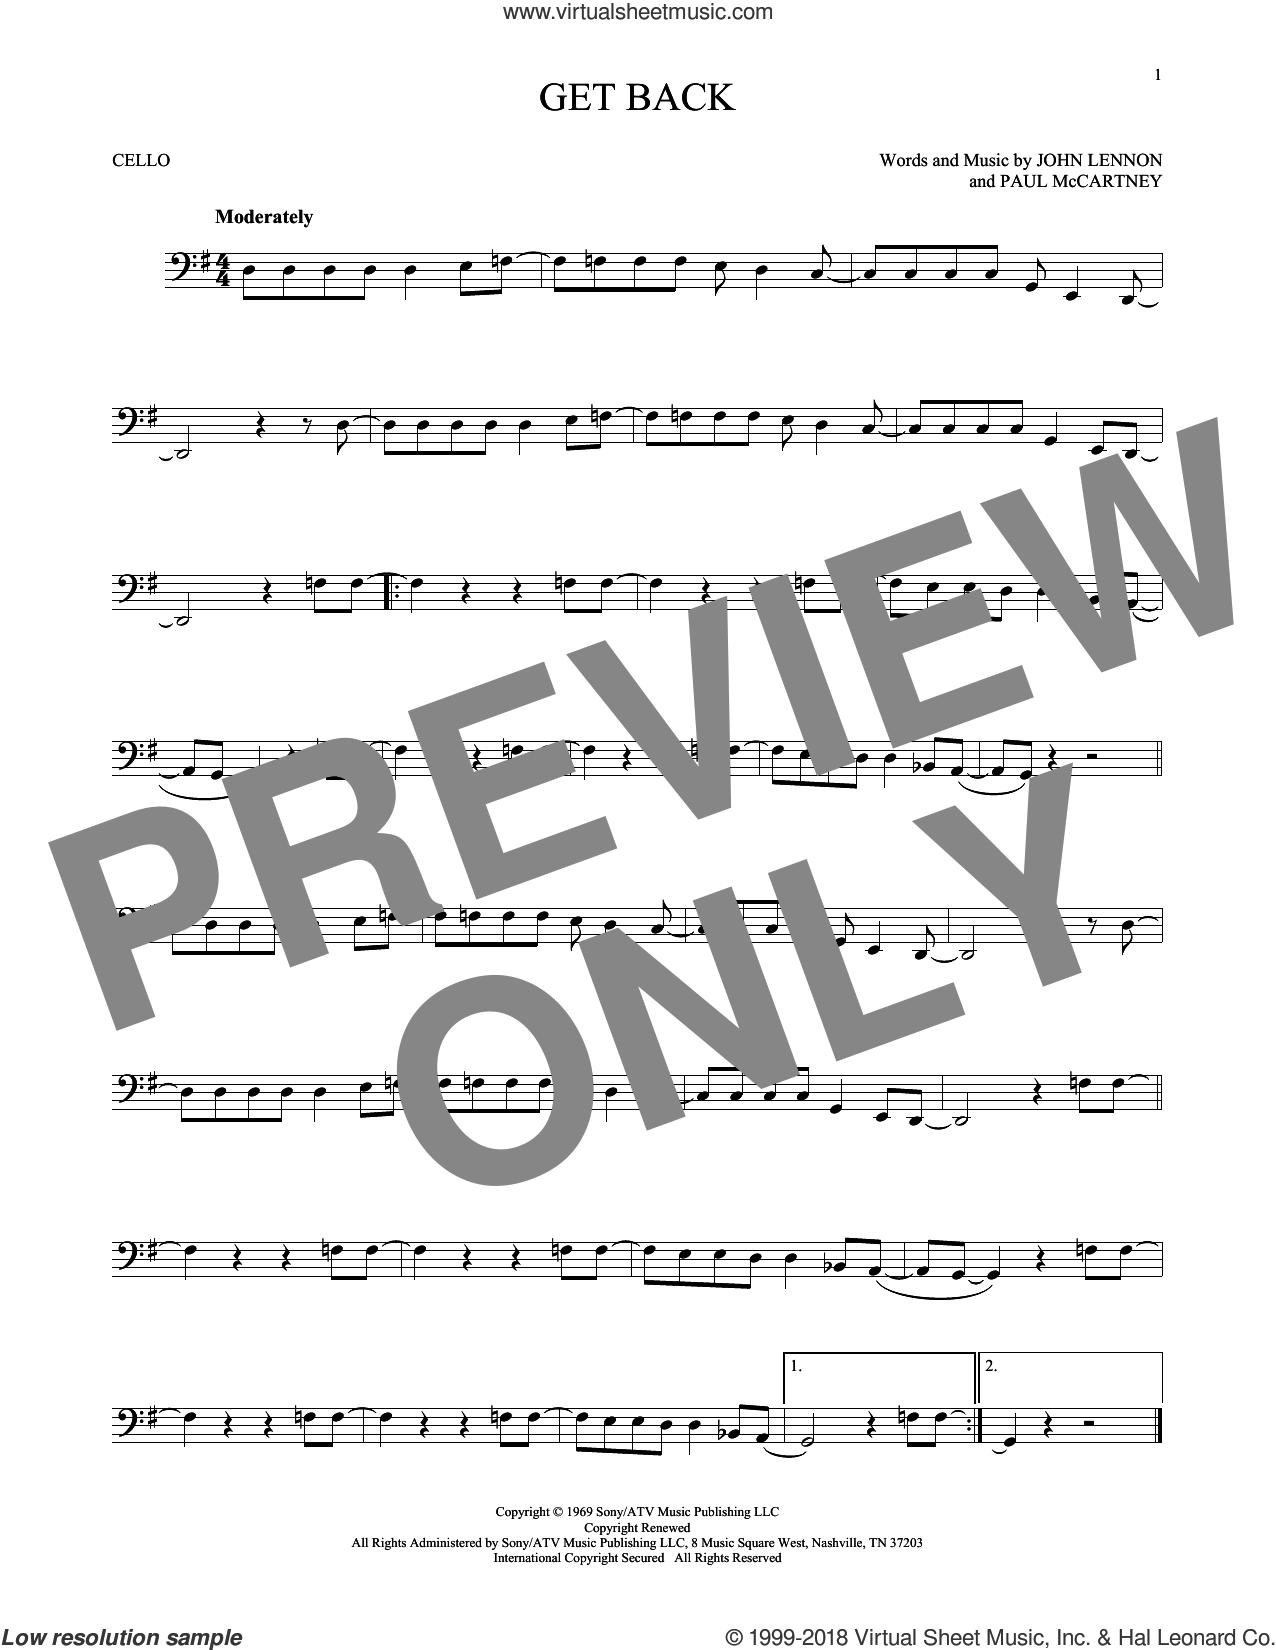 Get Back sheet music for cello solo by The Beatles, John Lennon and Paul McCartney, intermediate skill level